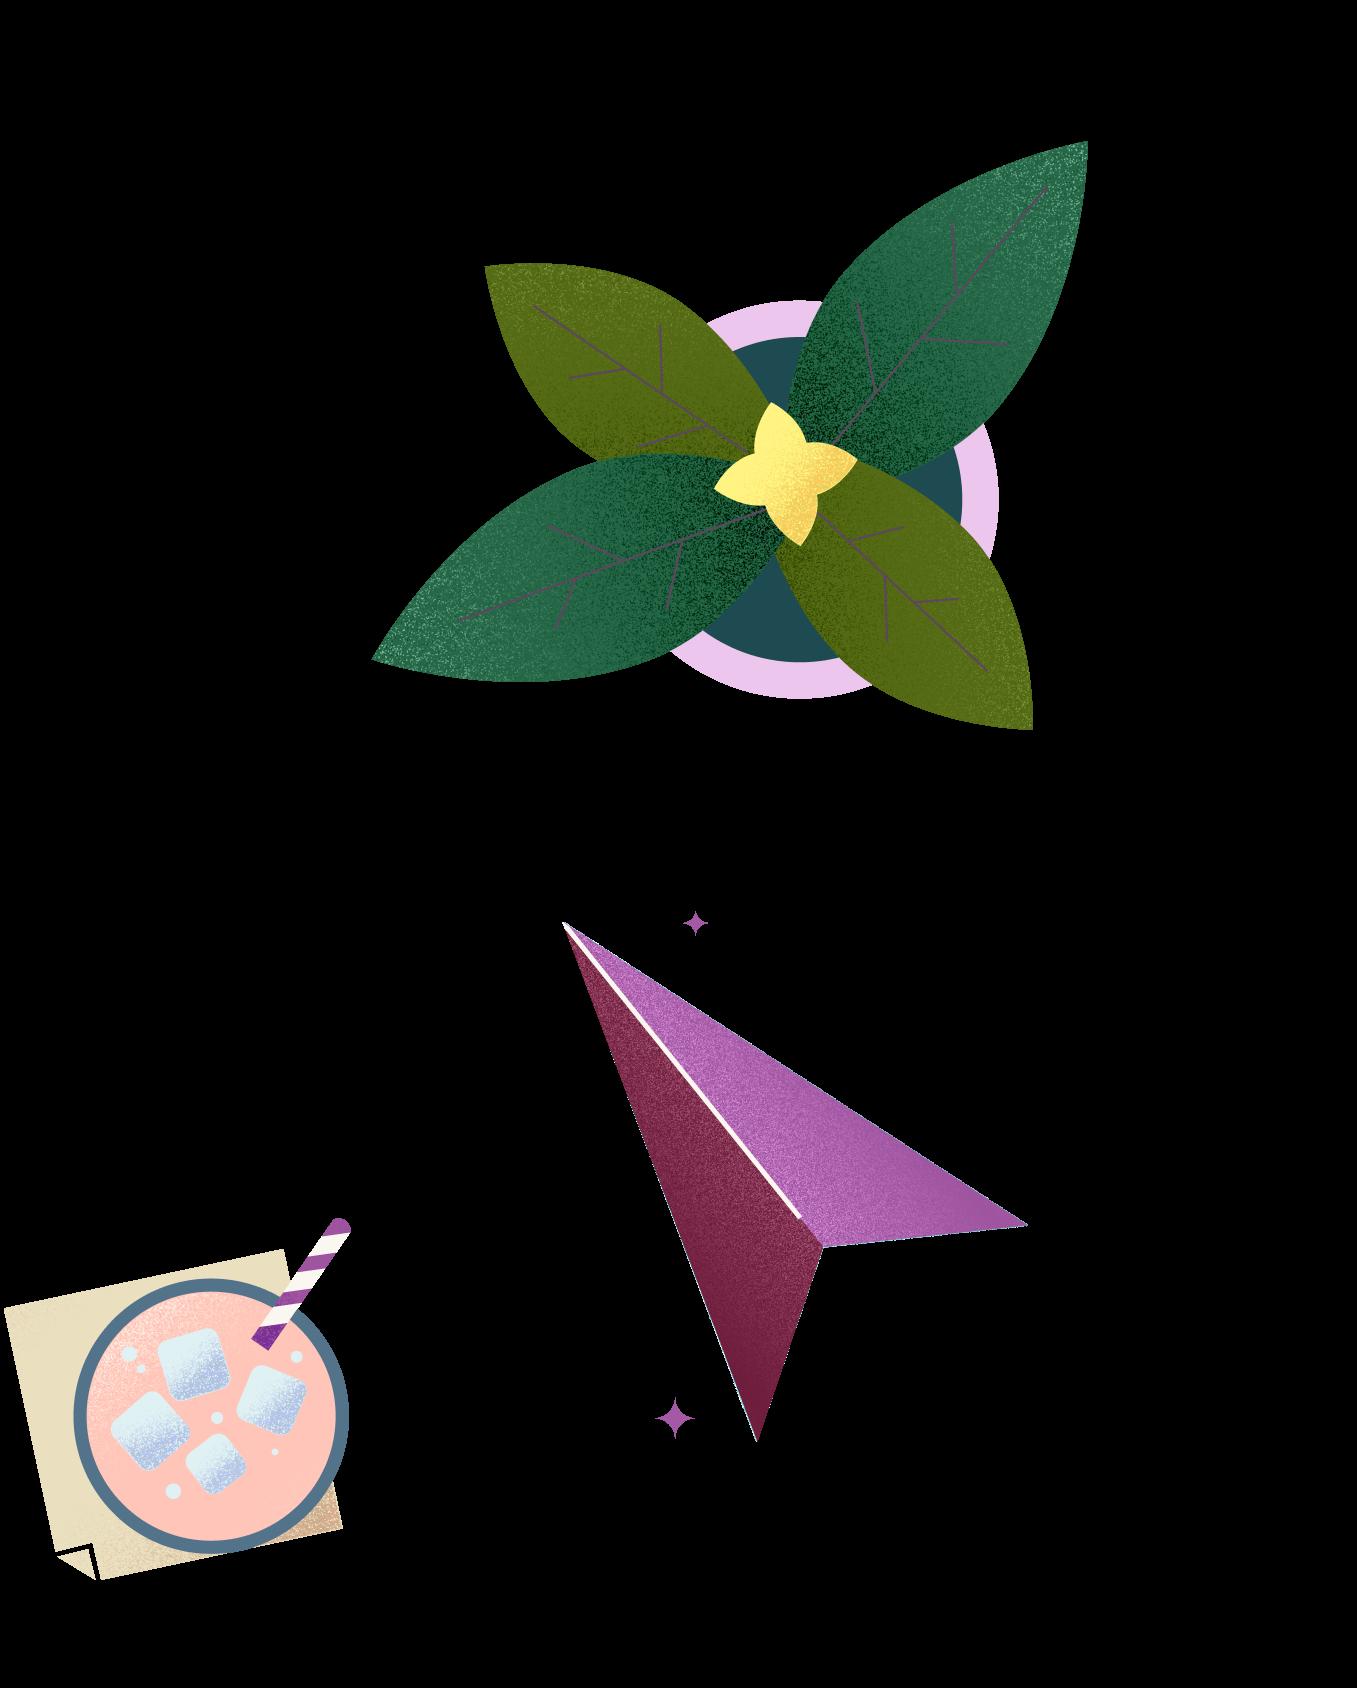 plant arrow hot chocolate illustration